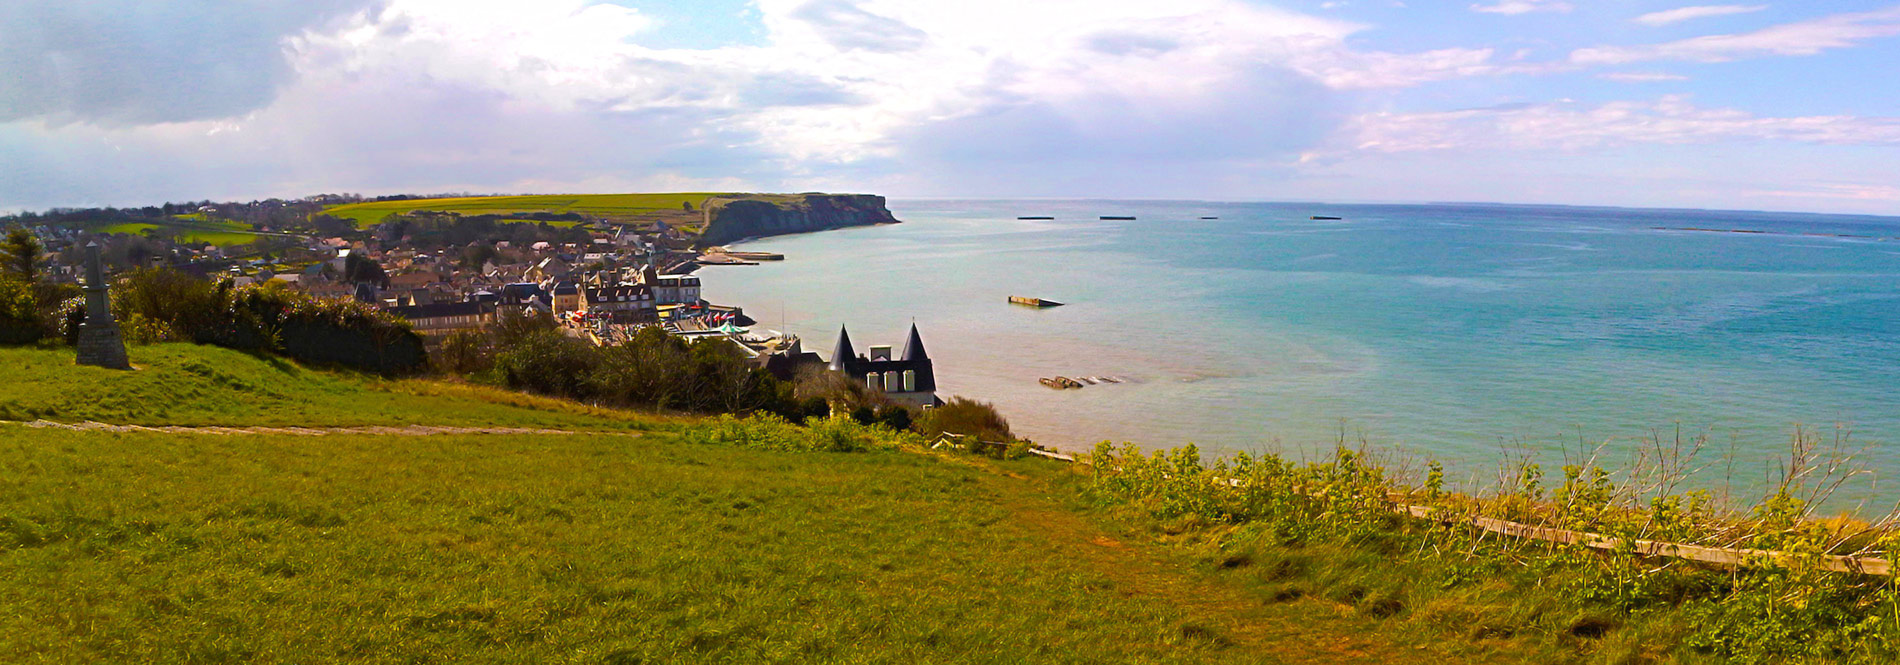 Camping normandie bord de mer vacances basse normandie for Camping basse normandie bord de mer avec piscine